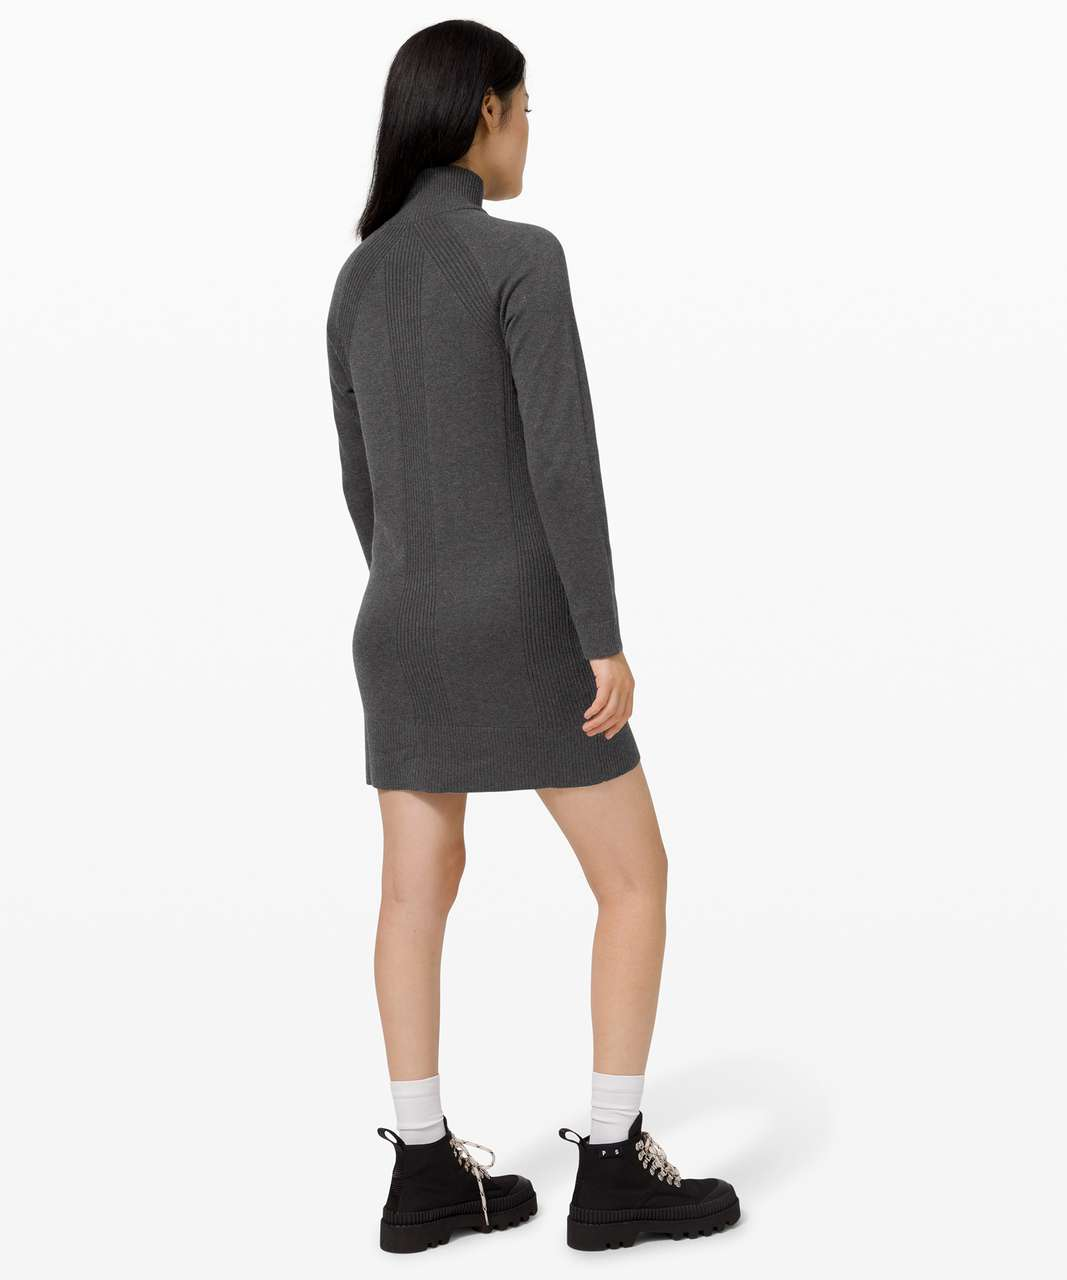 Lululemon Keep it Cozy Dress - Graphite Grey